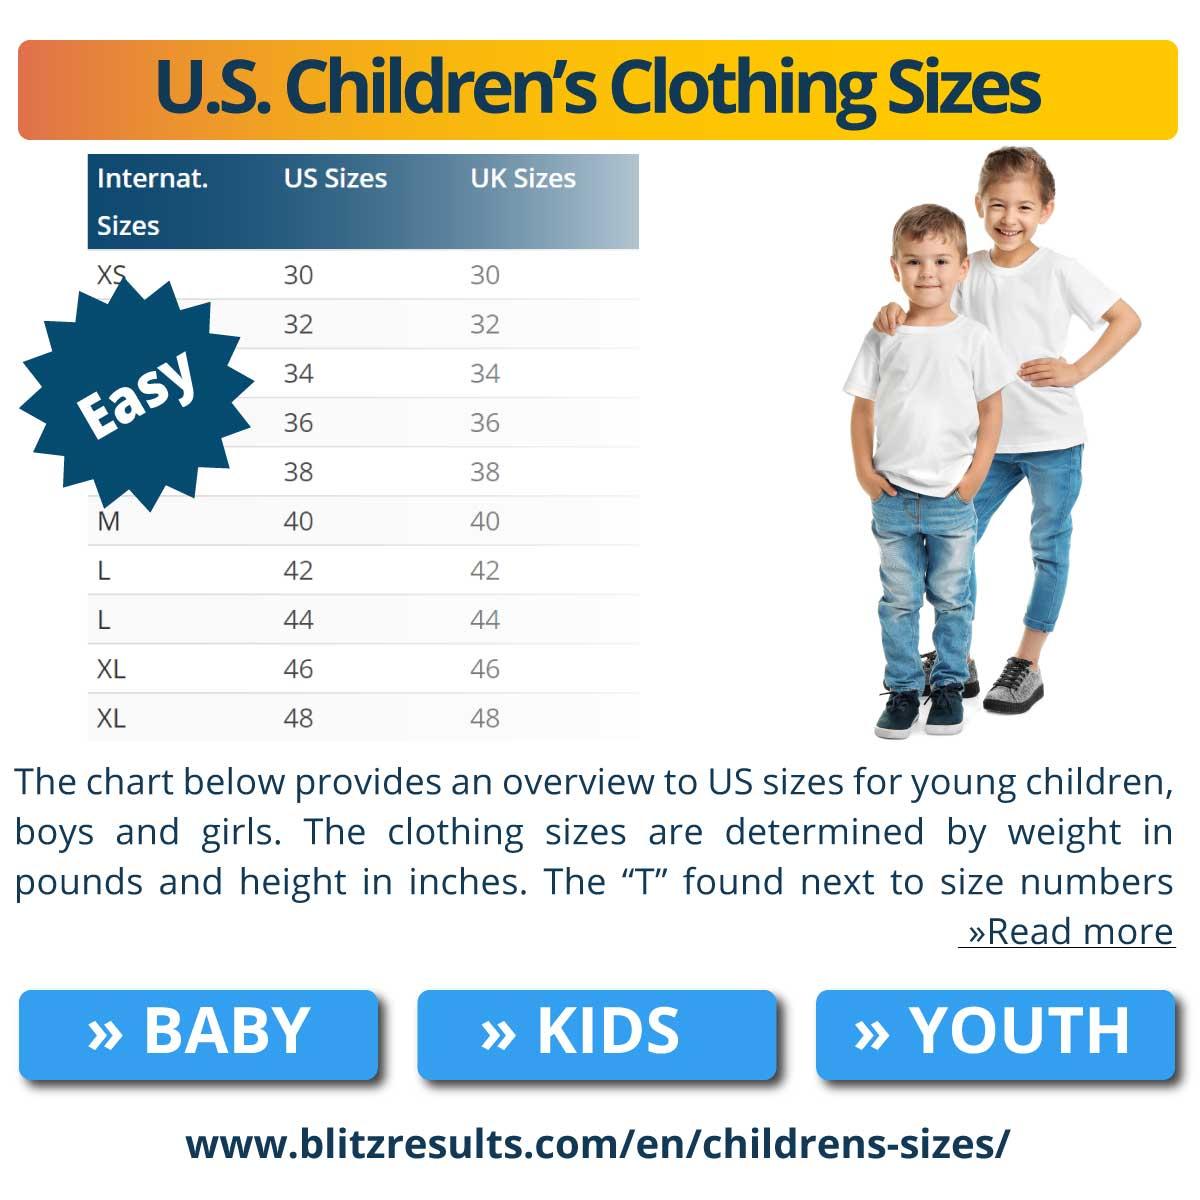 U.S. Children's Clothing Sizes